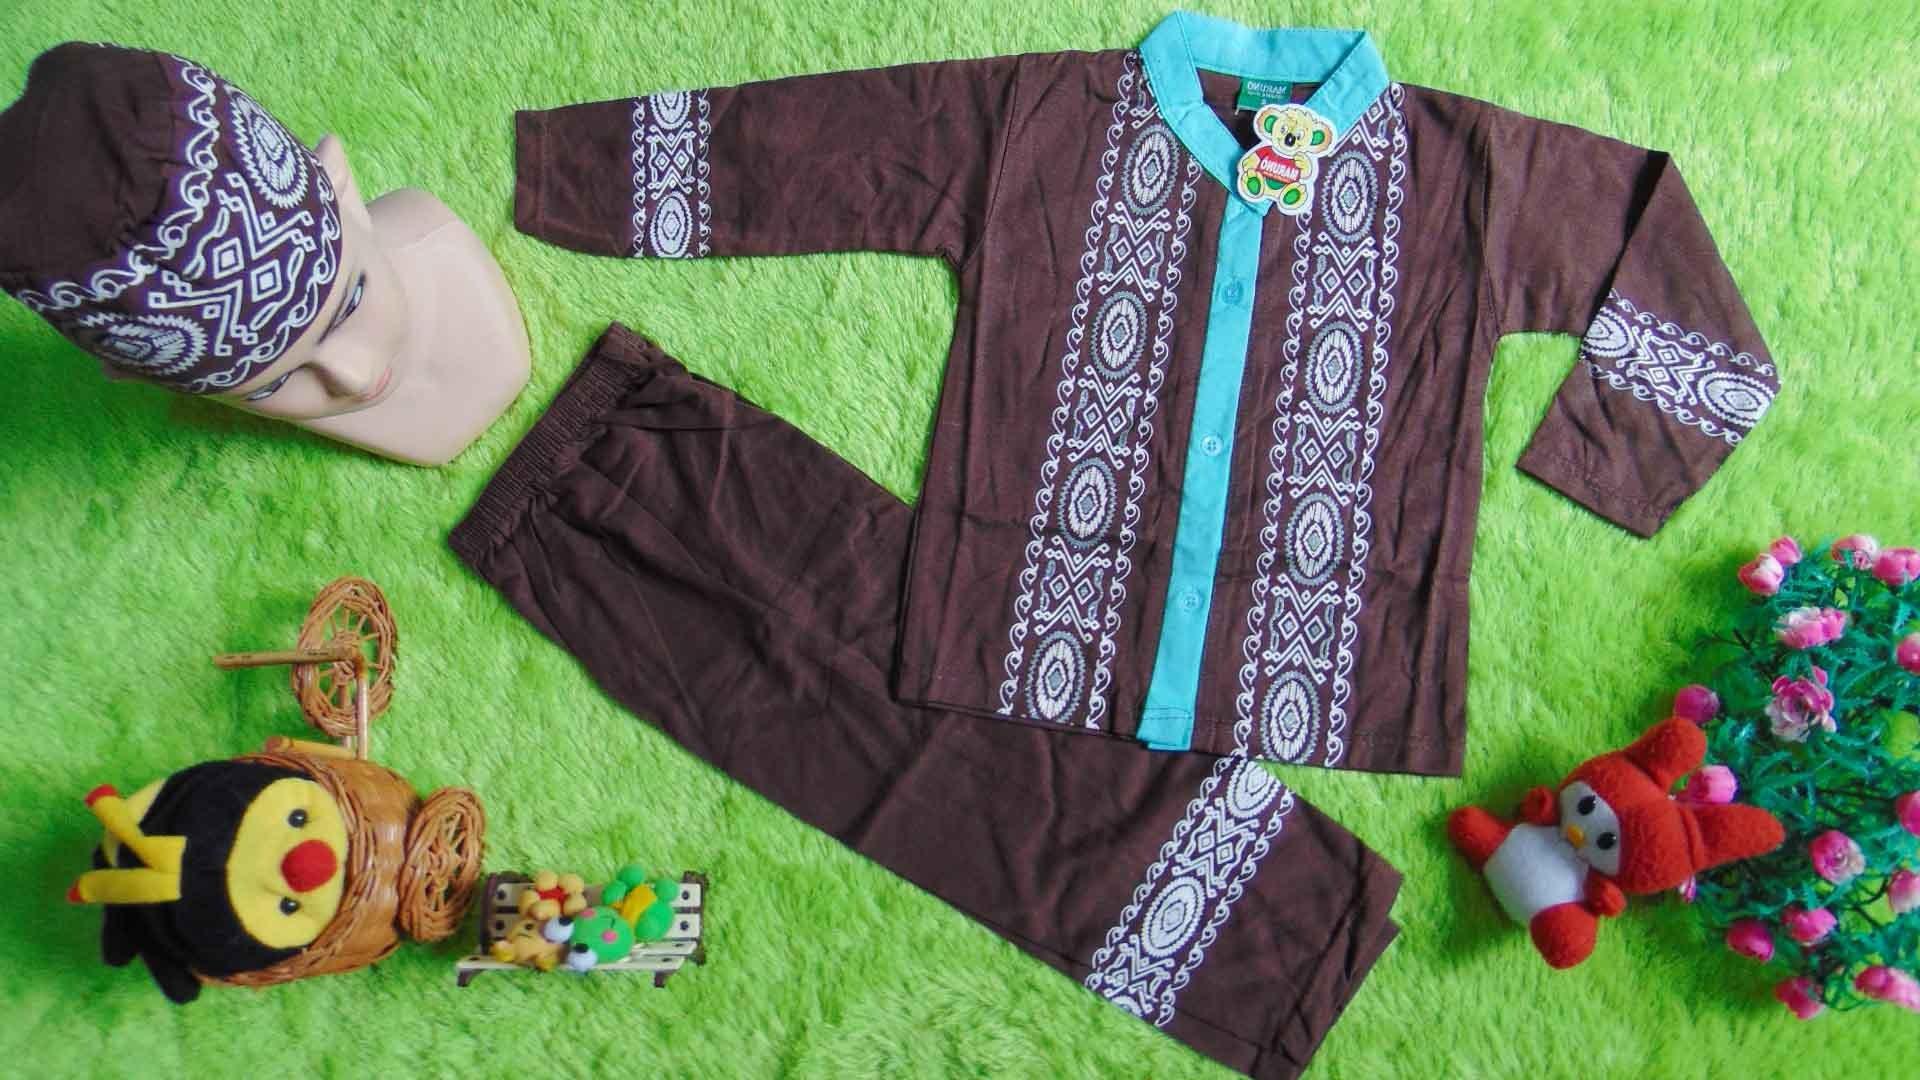 Ide Baju Lebaran Anak 2 Tahun Qwdq Paling Laris Setelan Baju Koko Muslim Lebaran Ramadhan